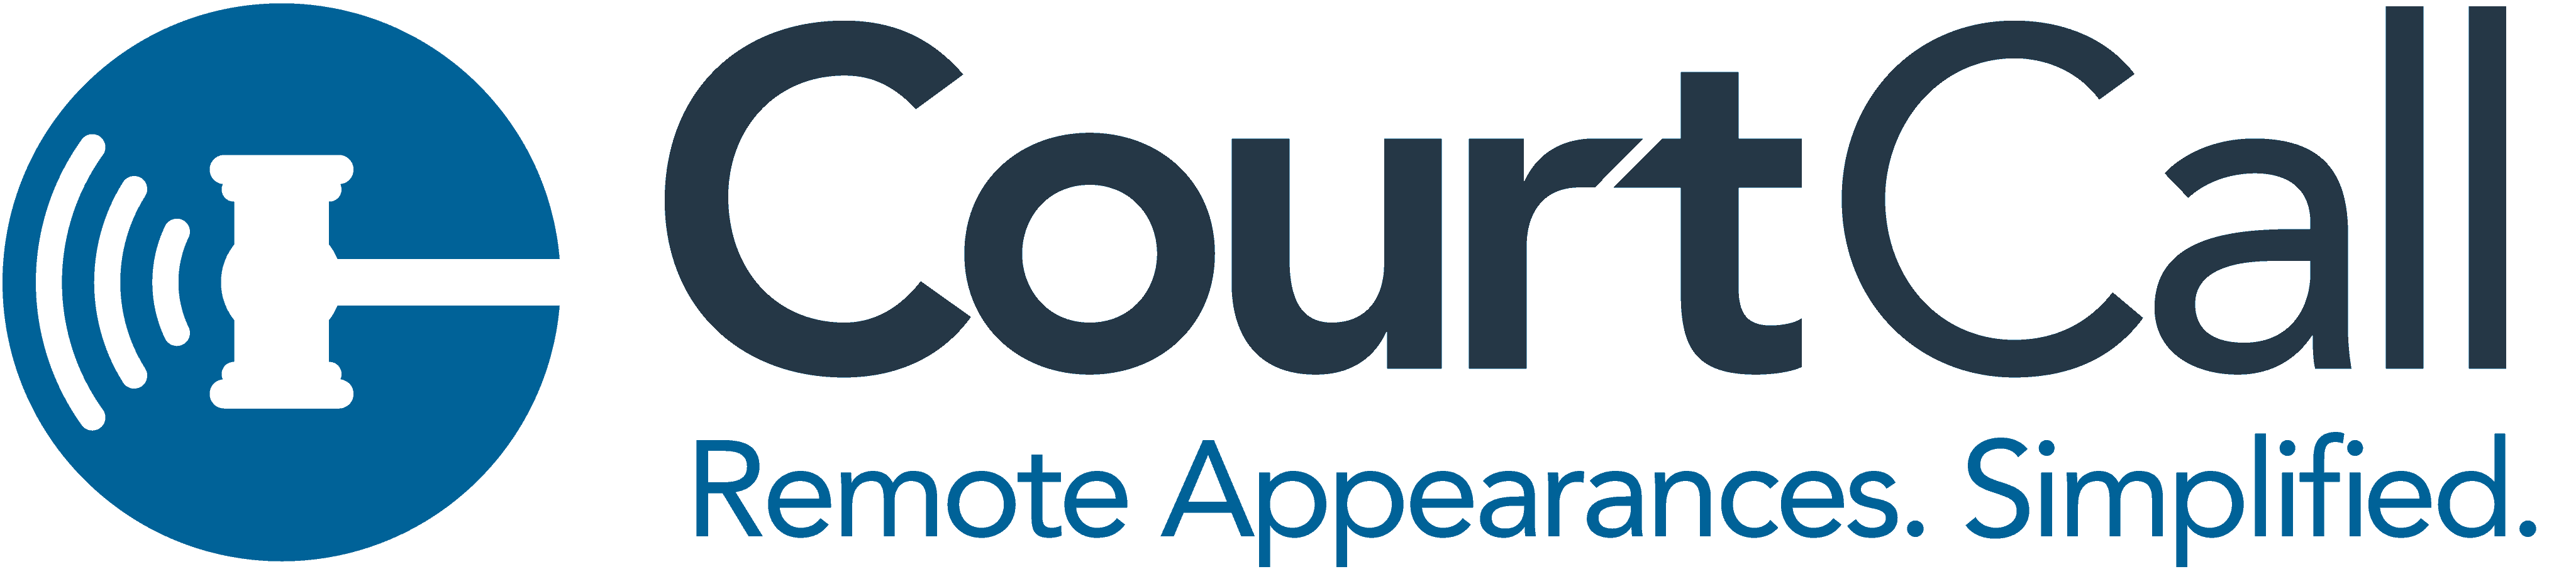 Court Call Logo